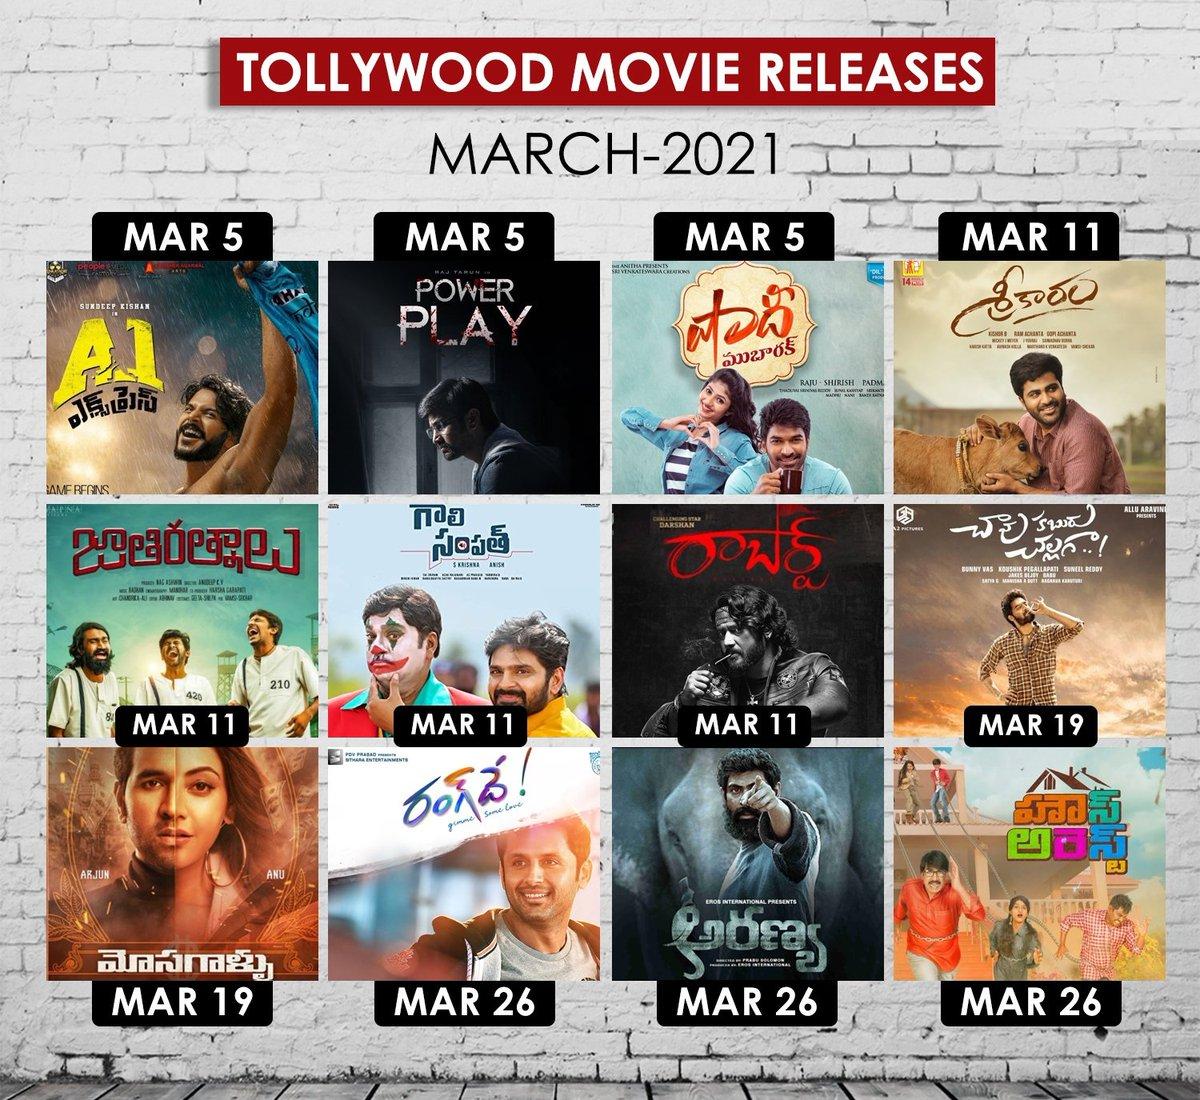 Take a Look at the #March 🎫 Upcoming Telugu Movie Releases🍟🎇  March 5th  #A1Express  #PowerPlay  #ShaadiMubarak   March 11th  #Sreekaram  #JathiRatnalu  #GaaliSampath  #Roberrt   March 19th  #chavukaburuchallaga  #Mosagallu   #CelebrateCinema